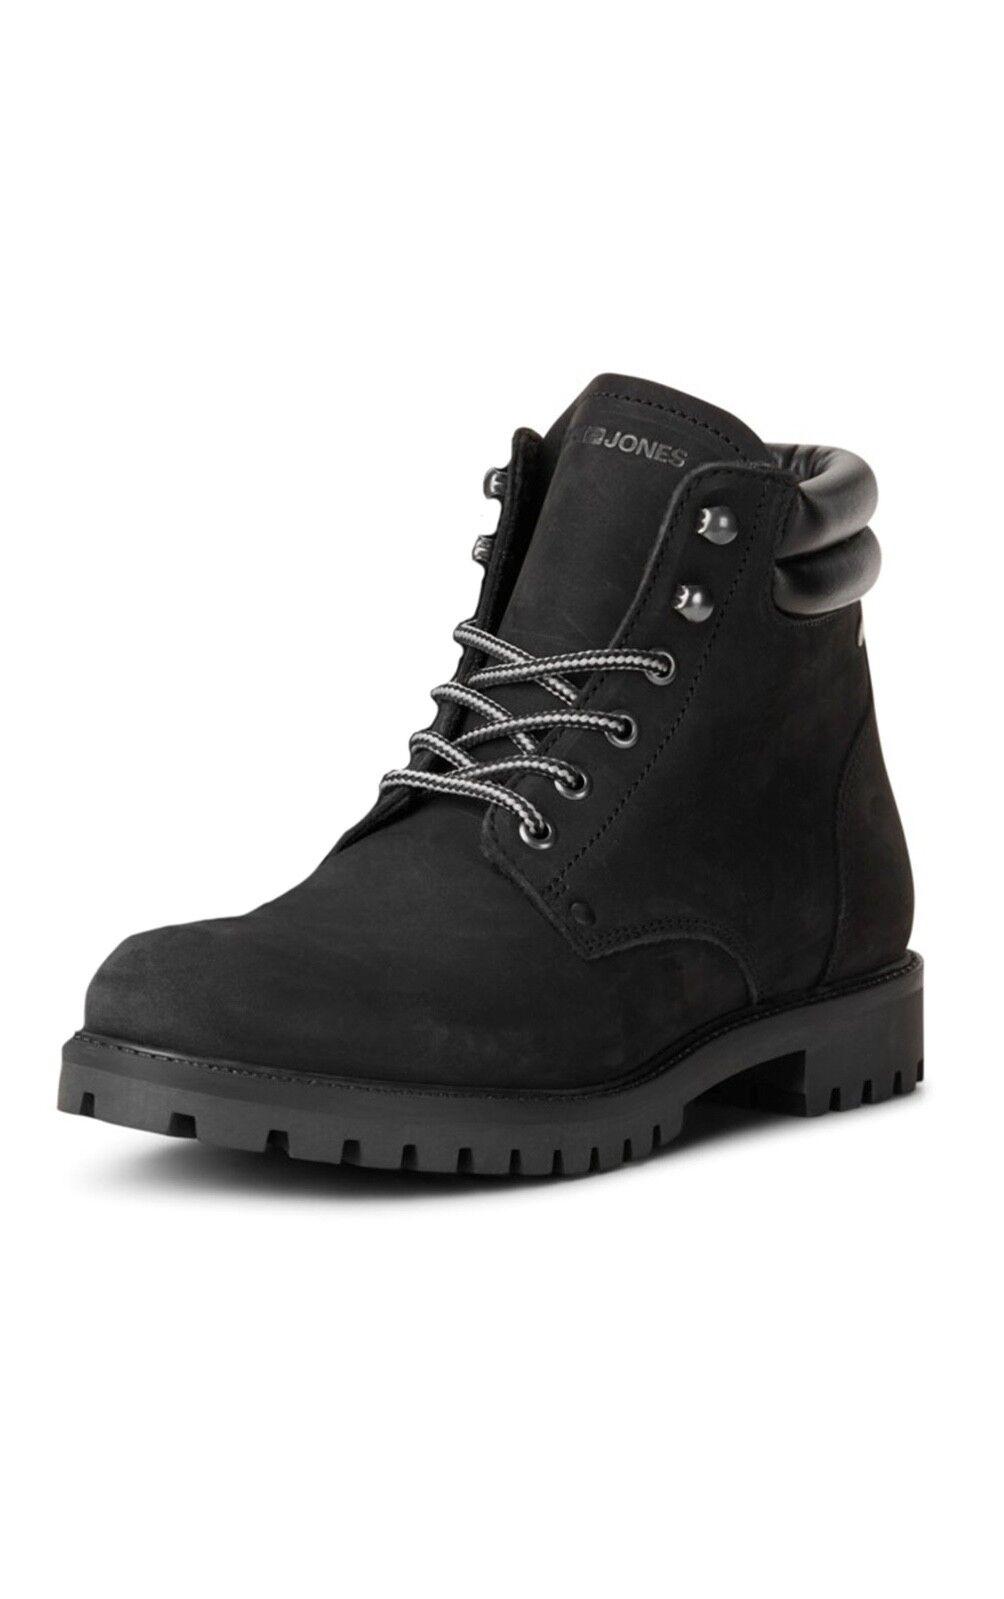 JACK & JONES Nubuck Stoke Leather Boots High Top shoes Mono Black Biker Boot